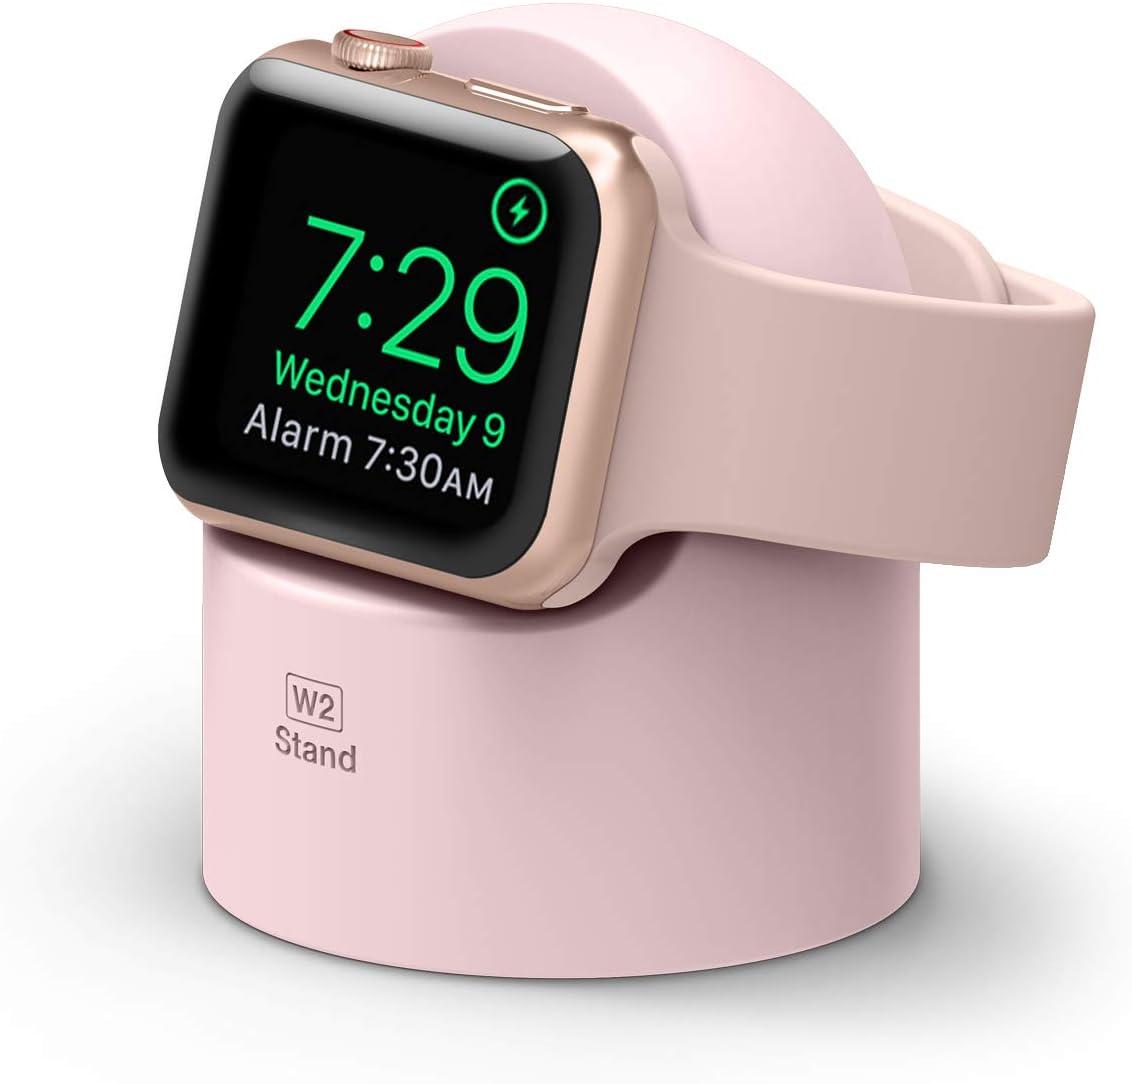 elago W2 Soporte Apple Watch Compatible con Apple Watch Series 6, SE (2020), 5, 4, 3, 2, 1 / 44mm, 42mm, 40mm, 38mm y el Modo de Nightstand (Lovely Rosa)